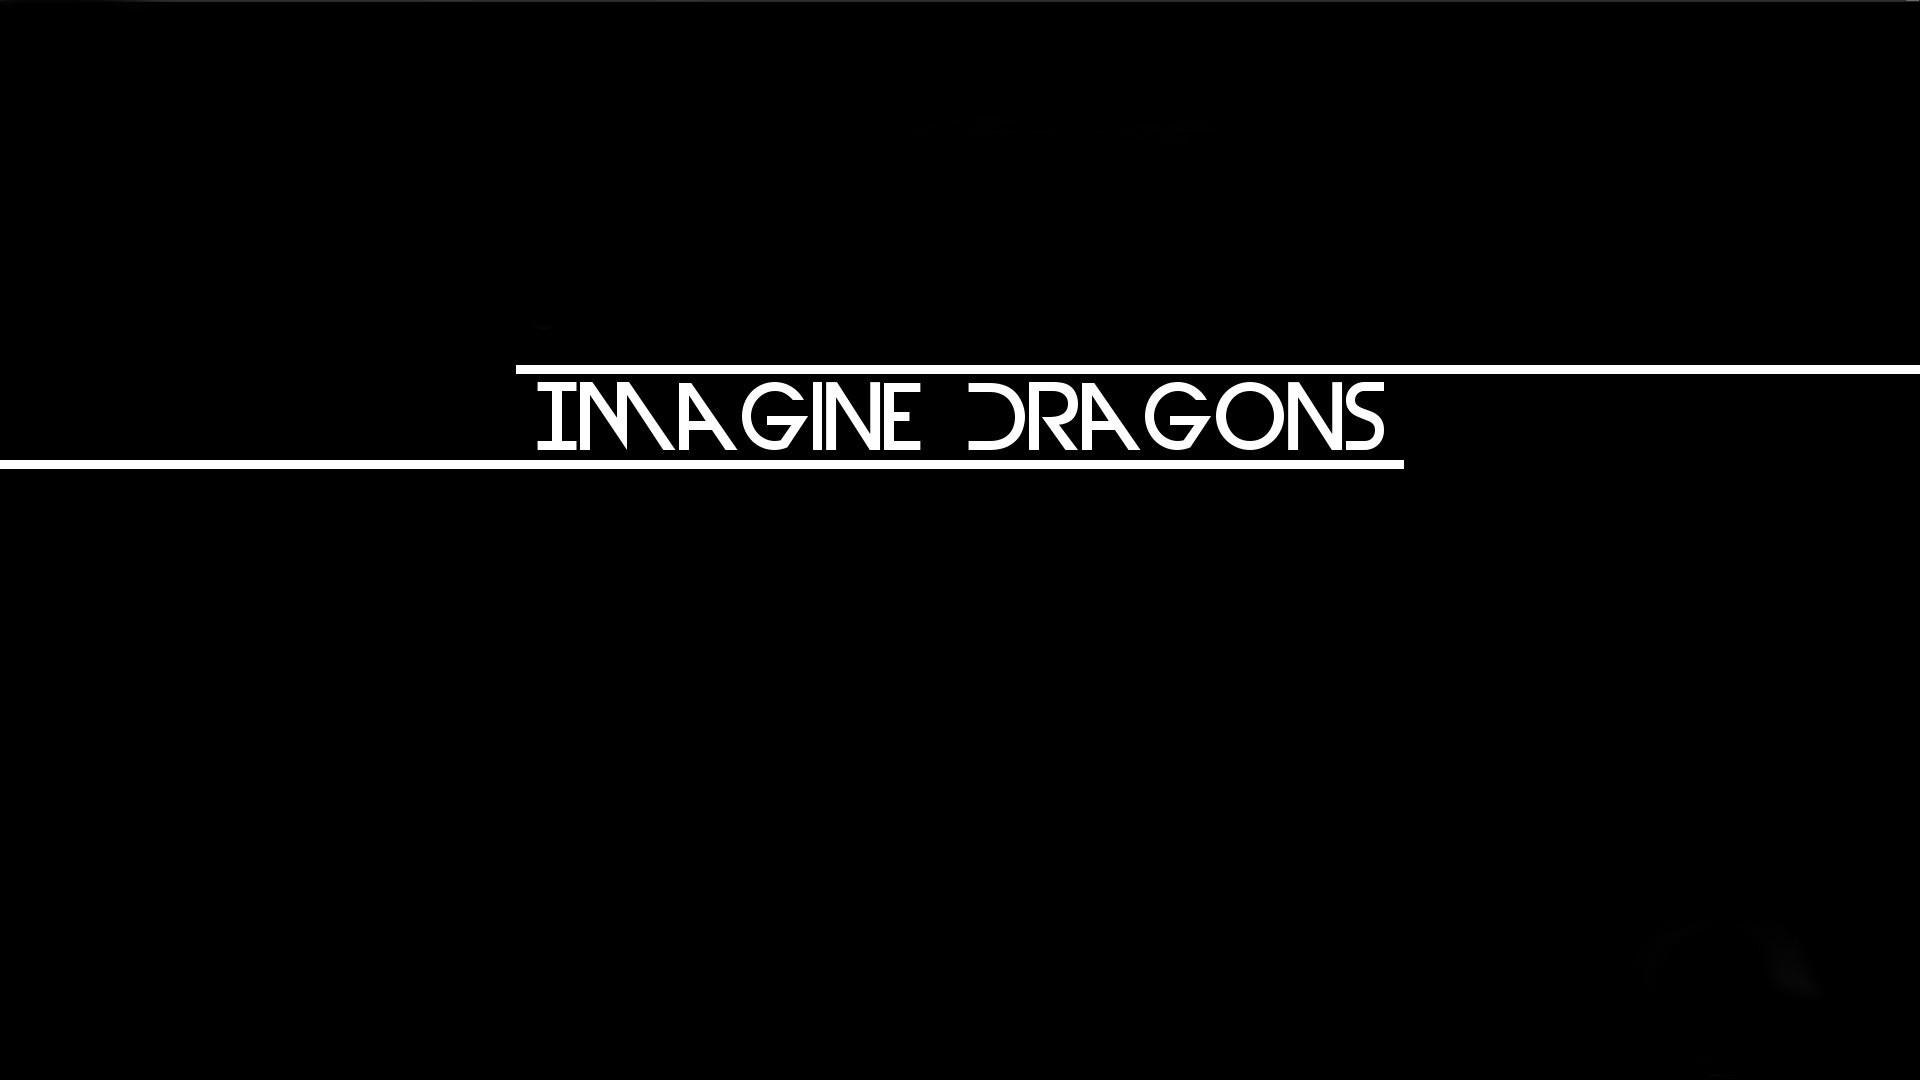 Imagine Dragons, ID: TZ658, Tameka Darville